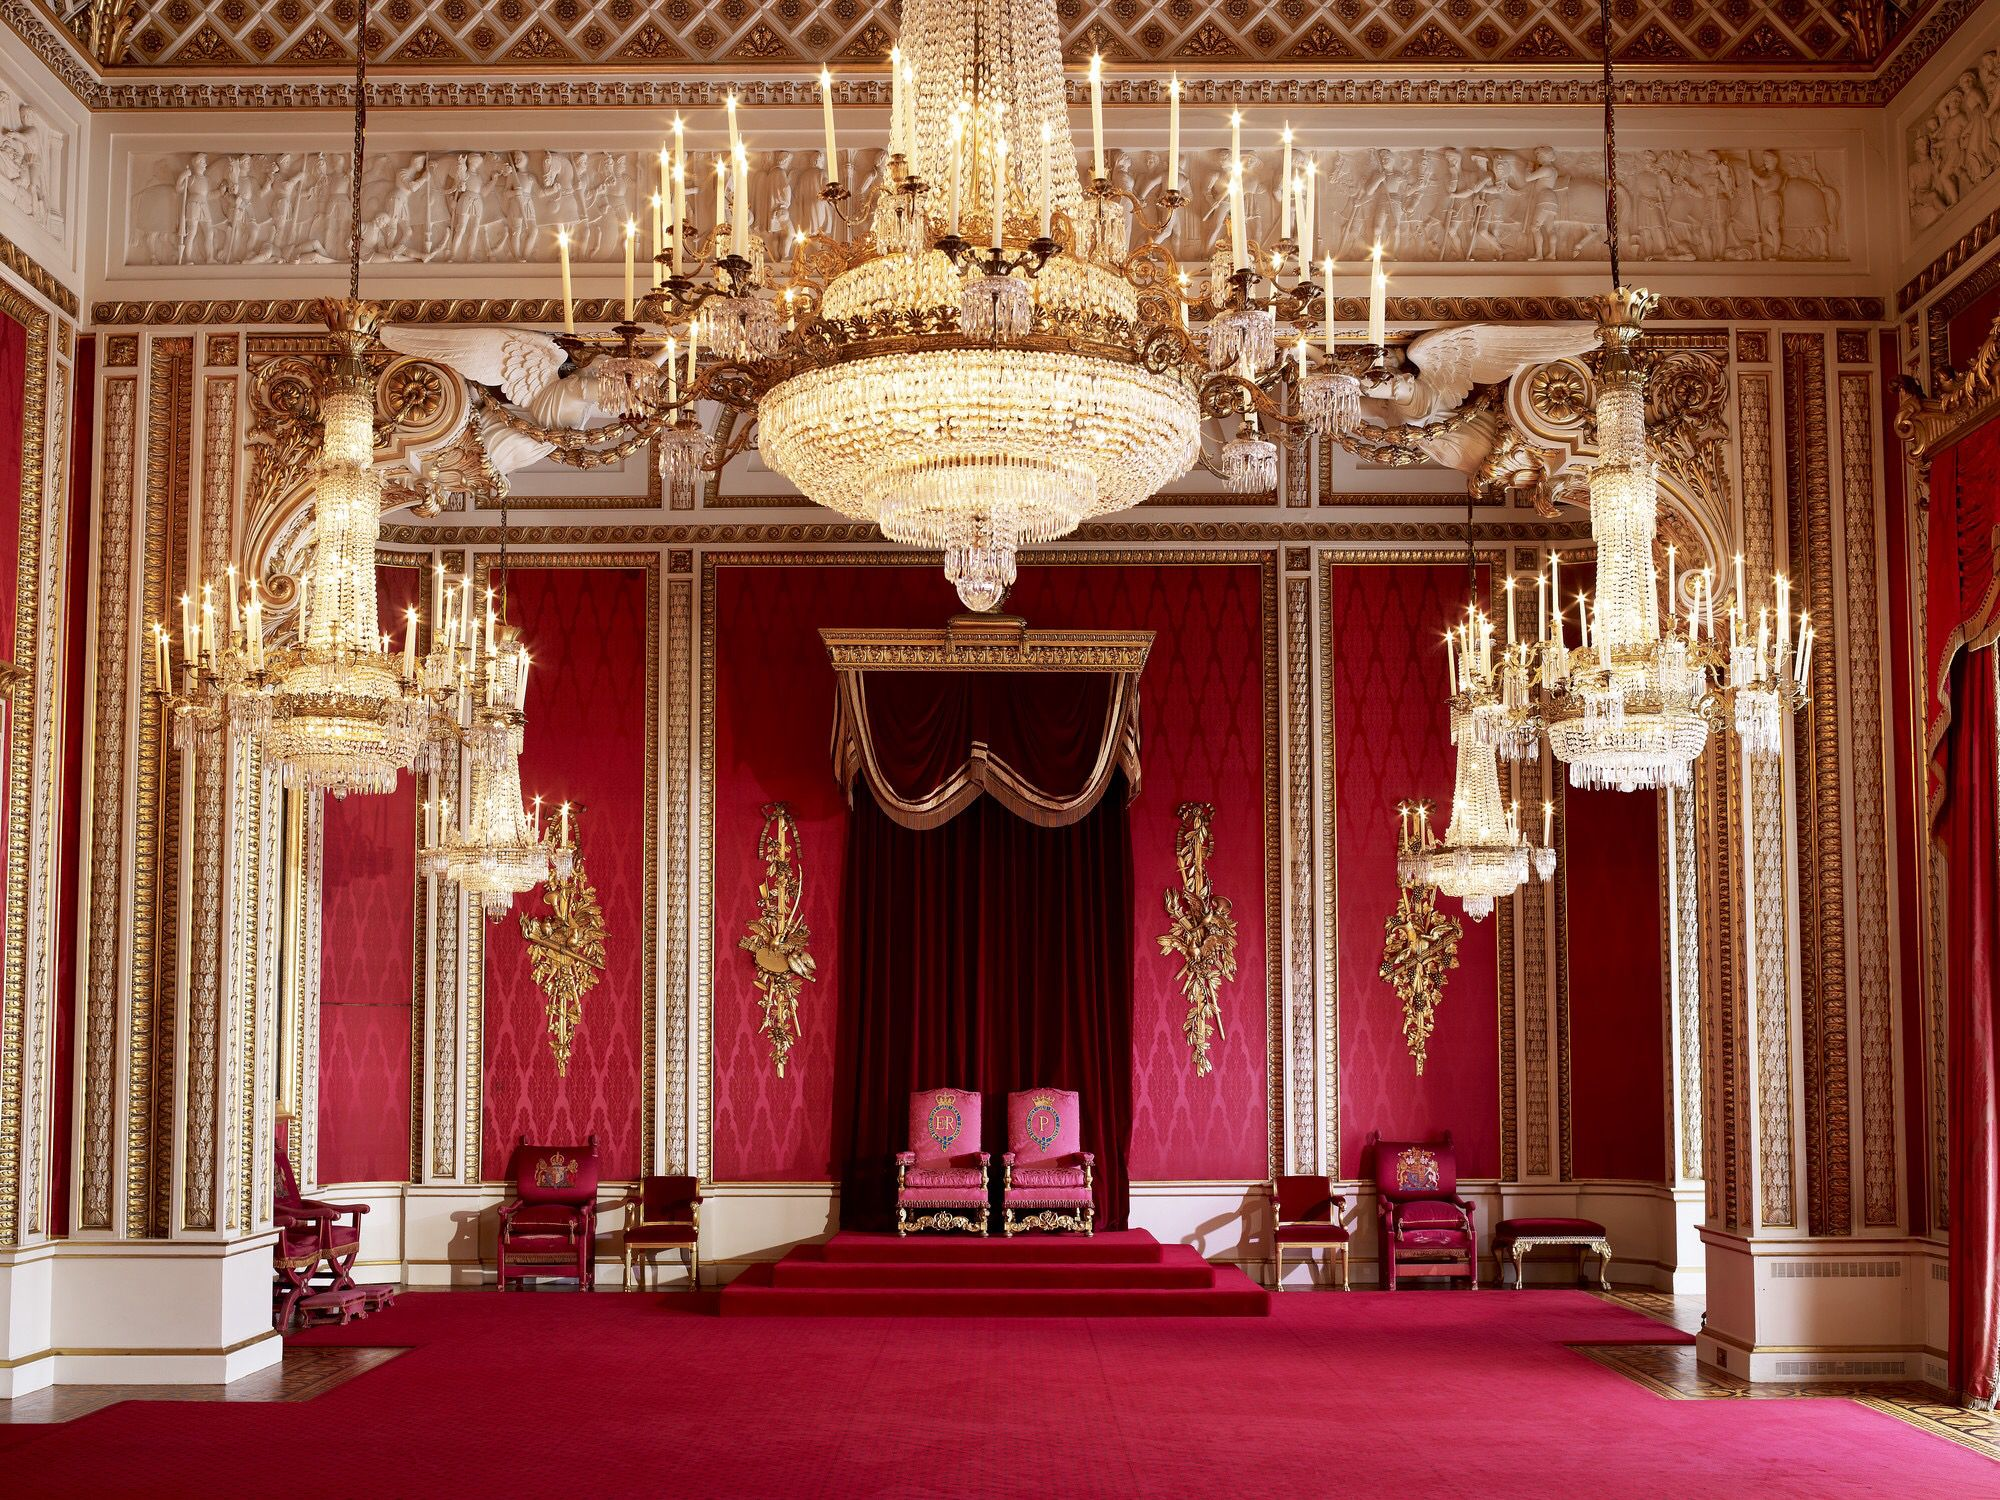 Throne room buckingham palace - Buckingham Palace Inside Throne Roomthe